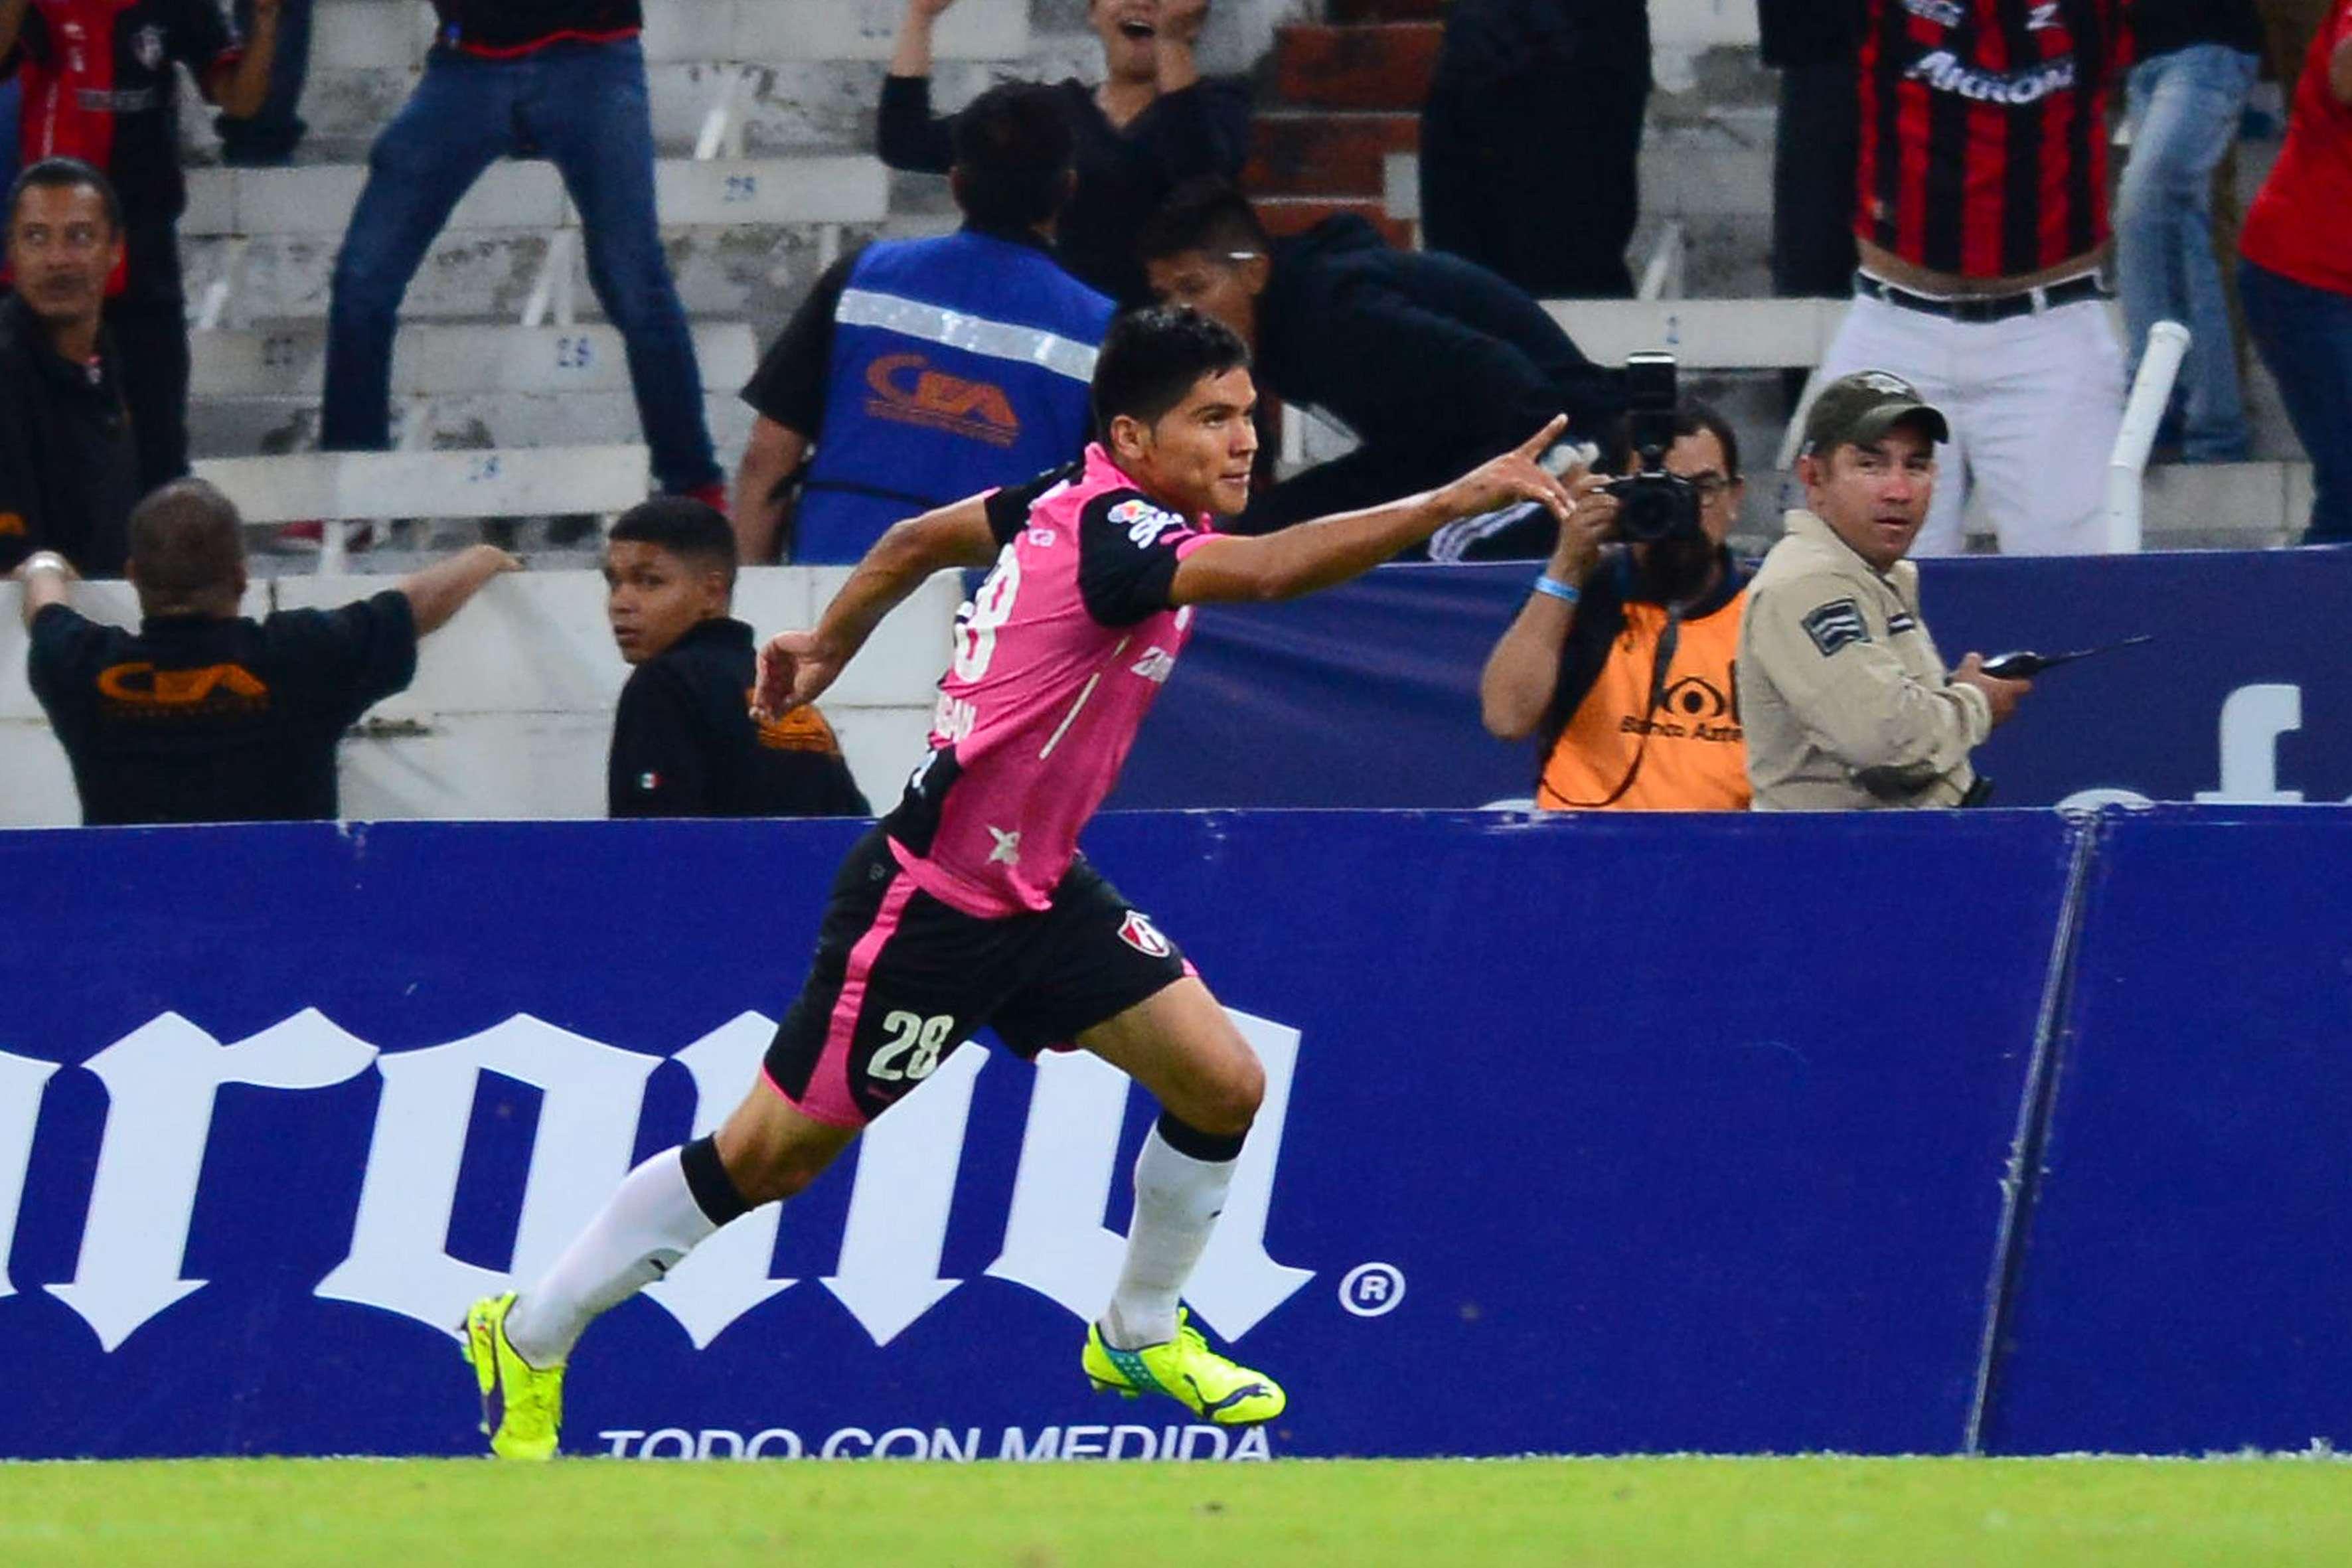 Barragán anota el gol del triunfo para Atlas. Foto: Mexsport